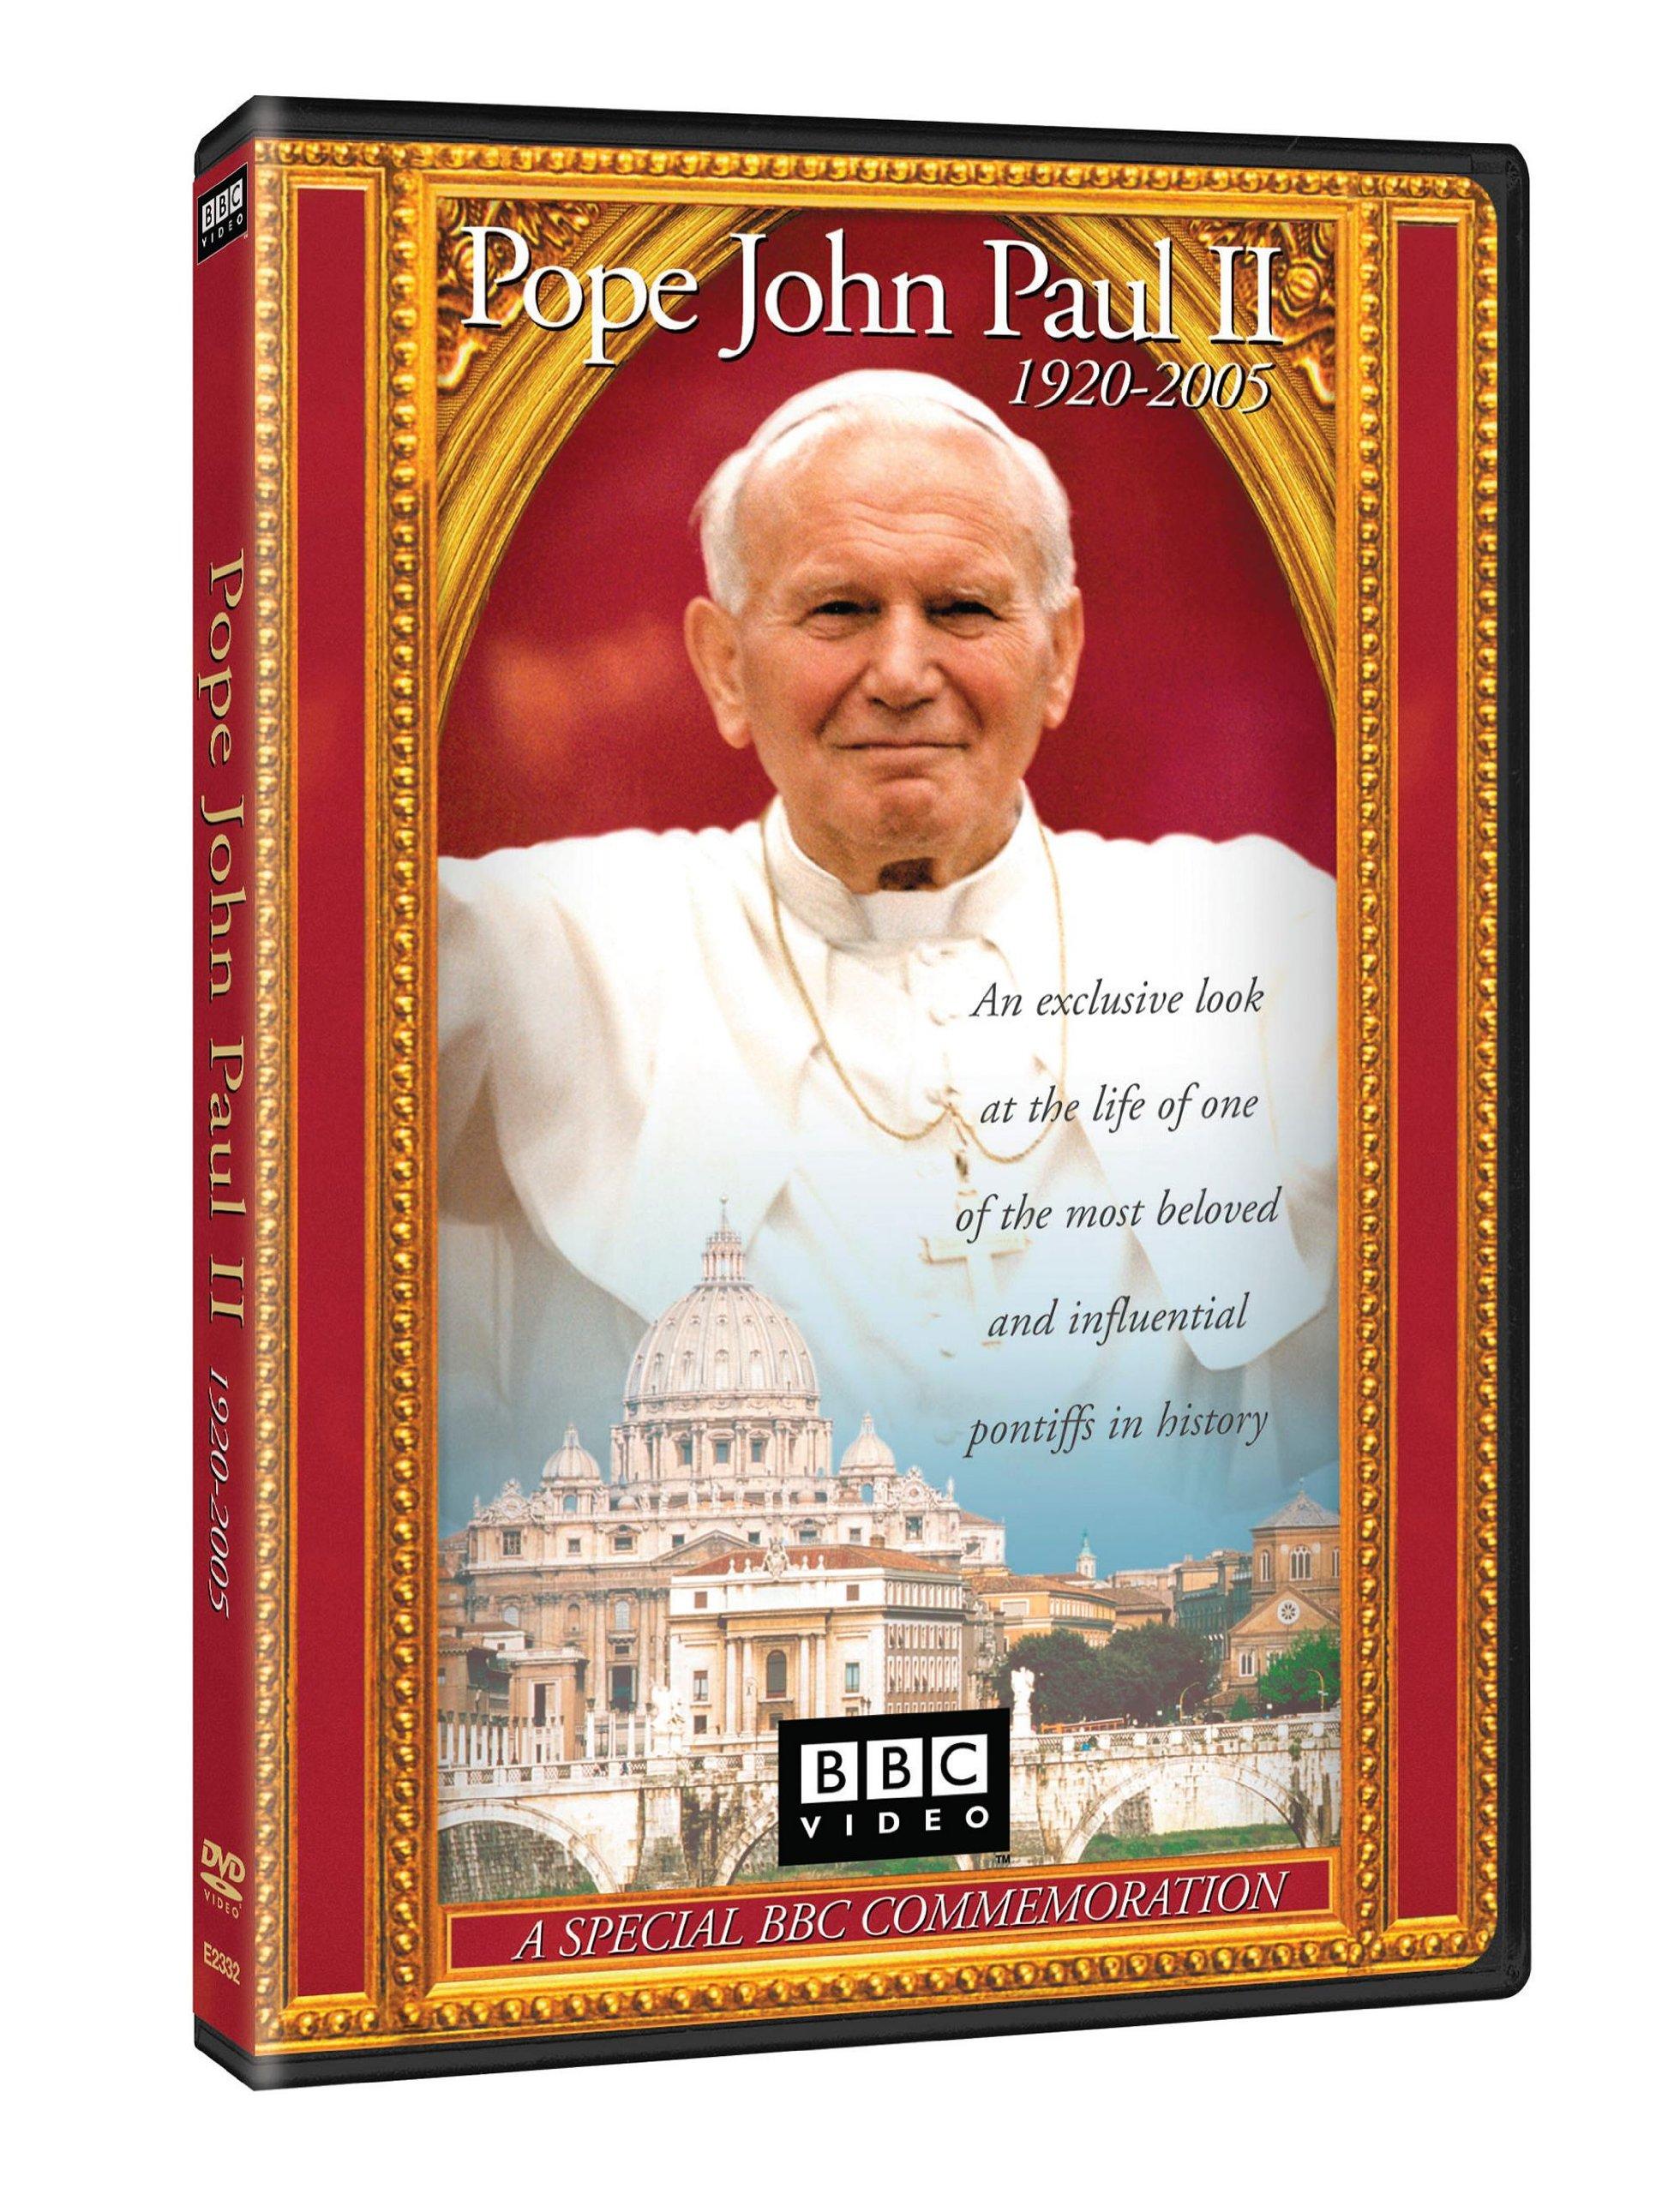 DVD : Pope John Paul Ii 1920-2005 (DVD)